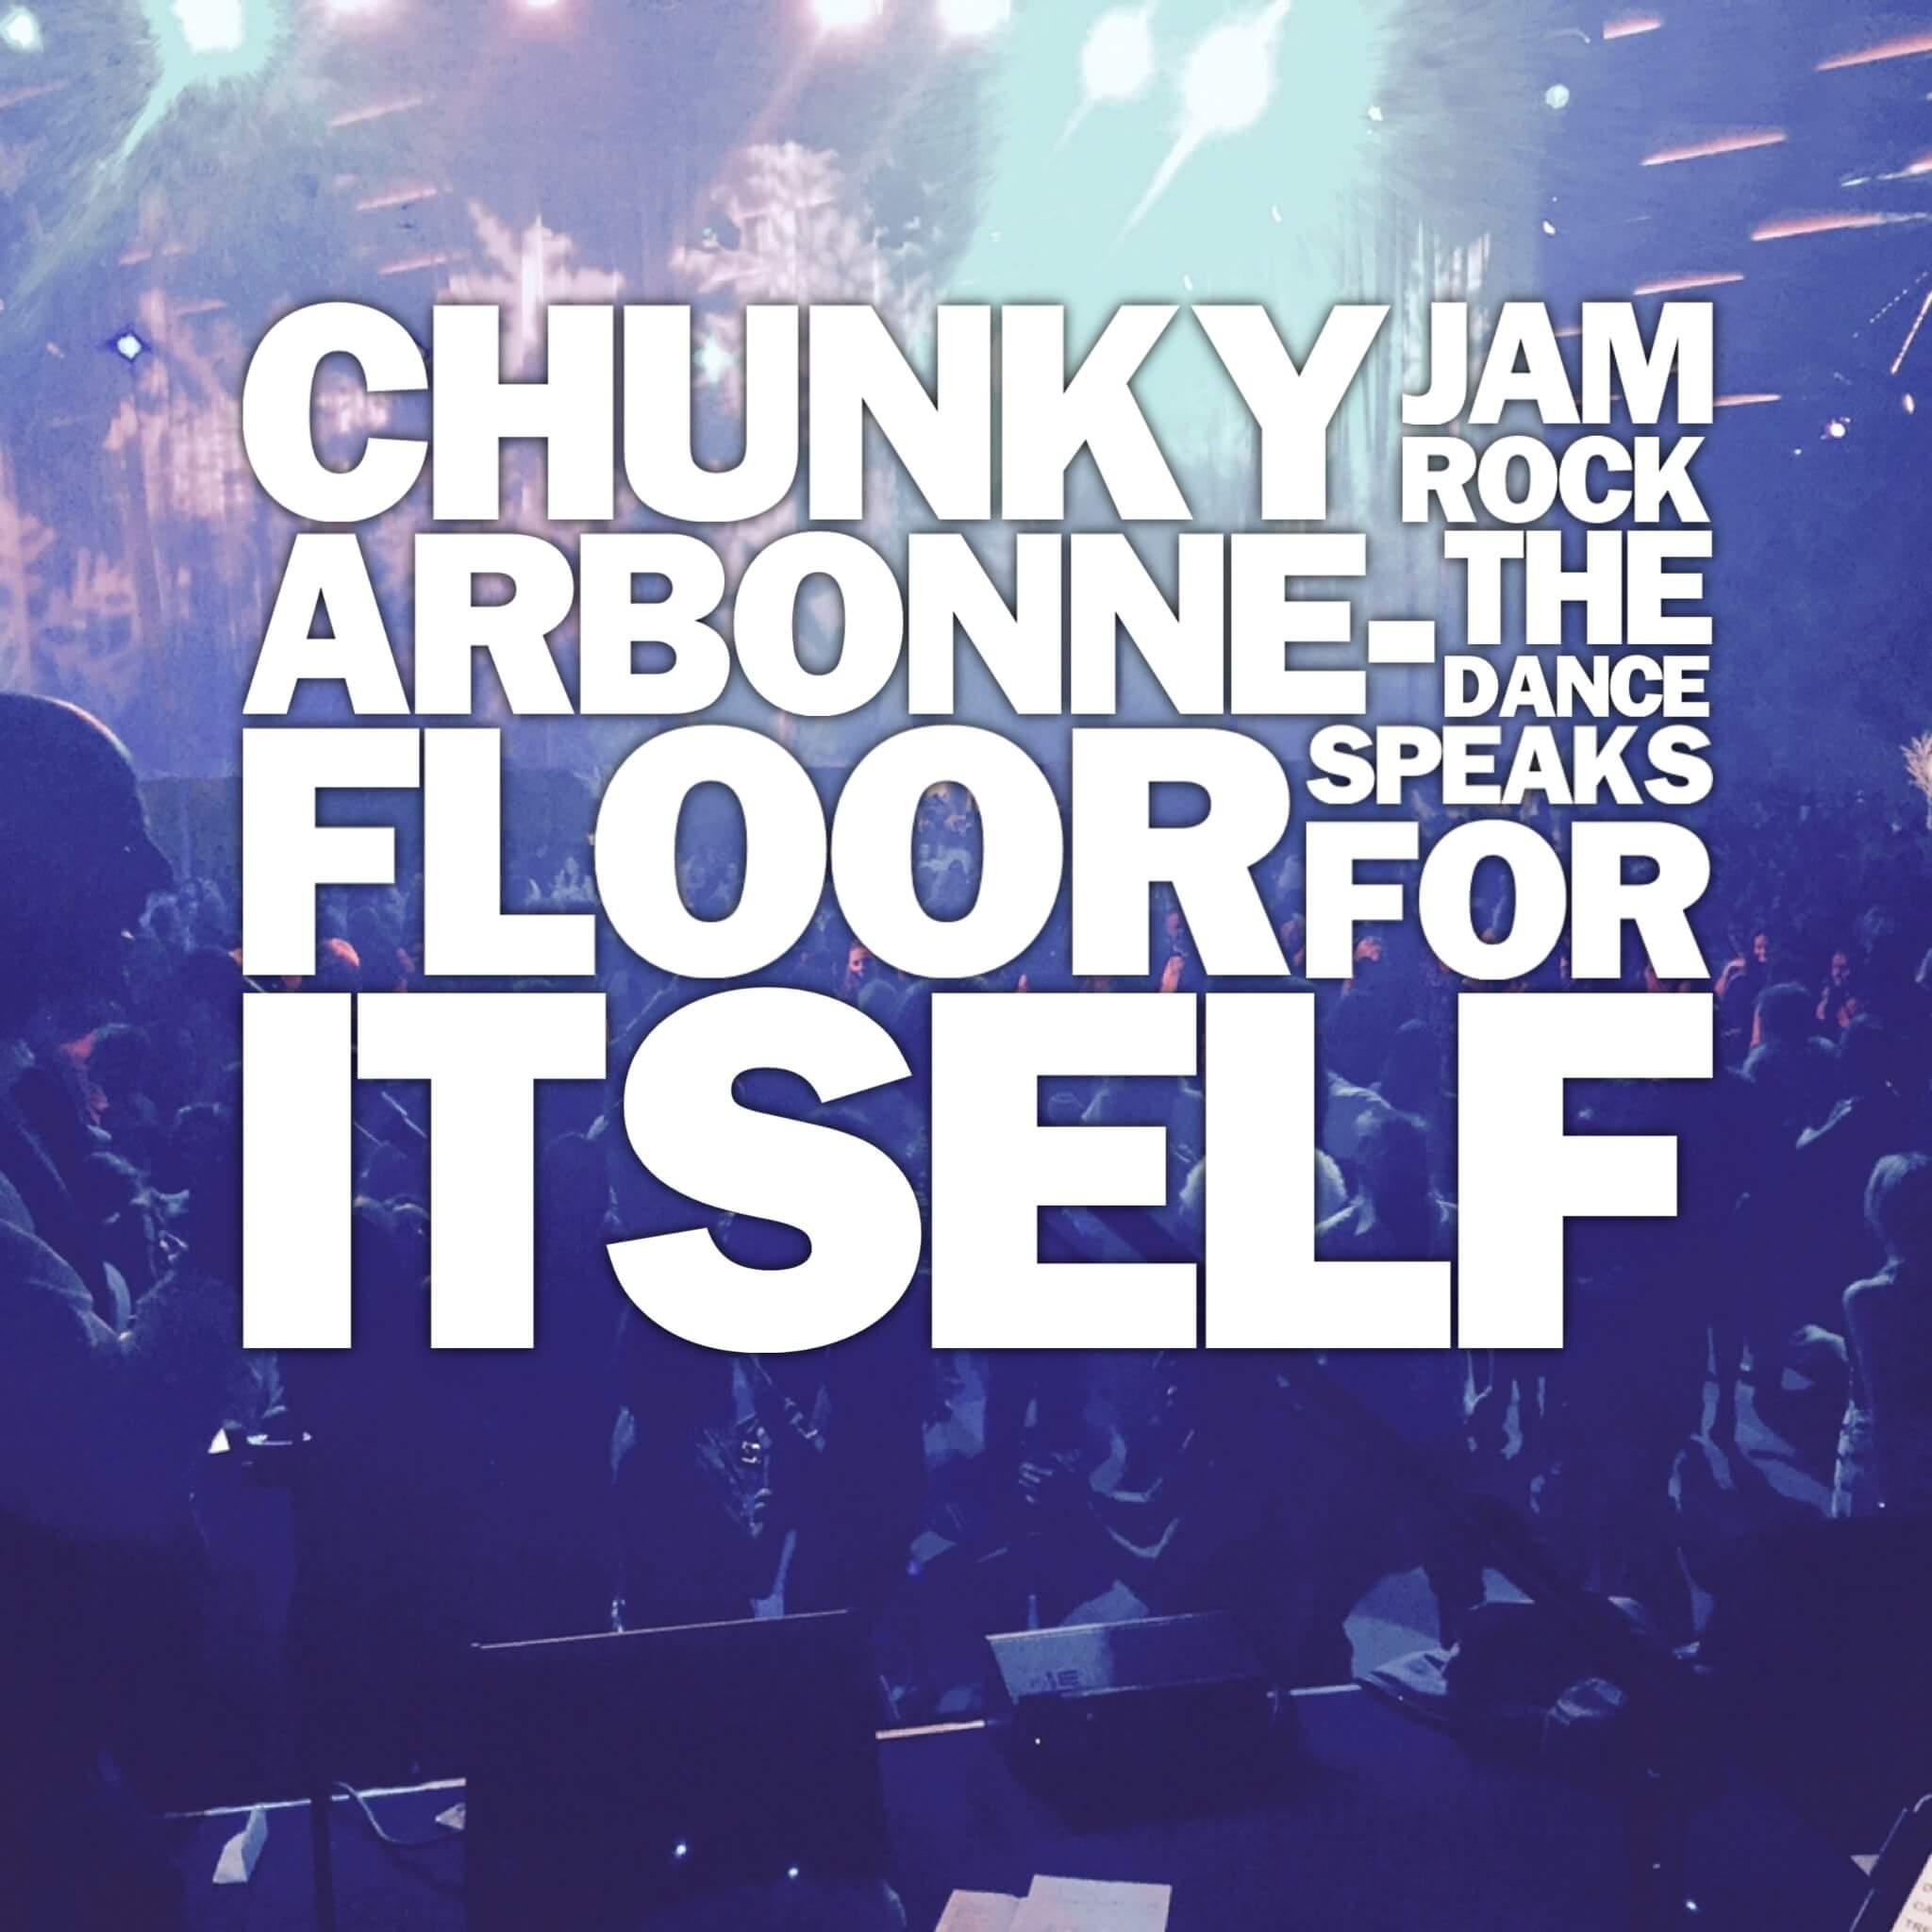 Chunky Jam do it for Arbonne